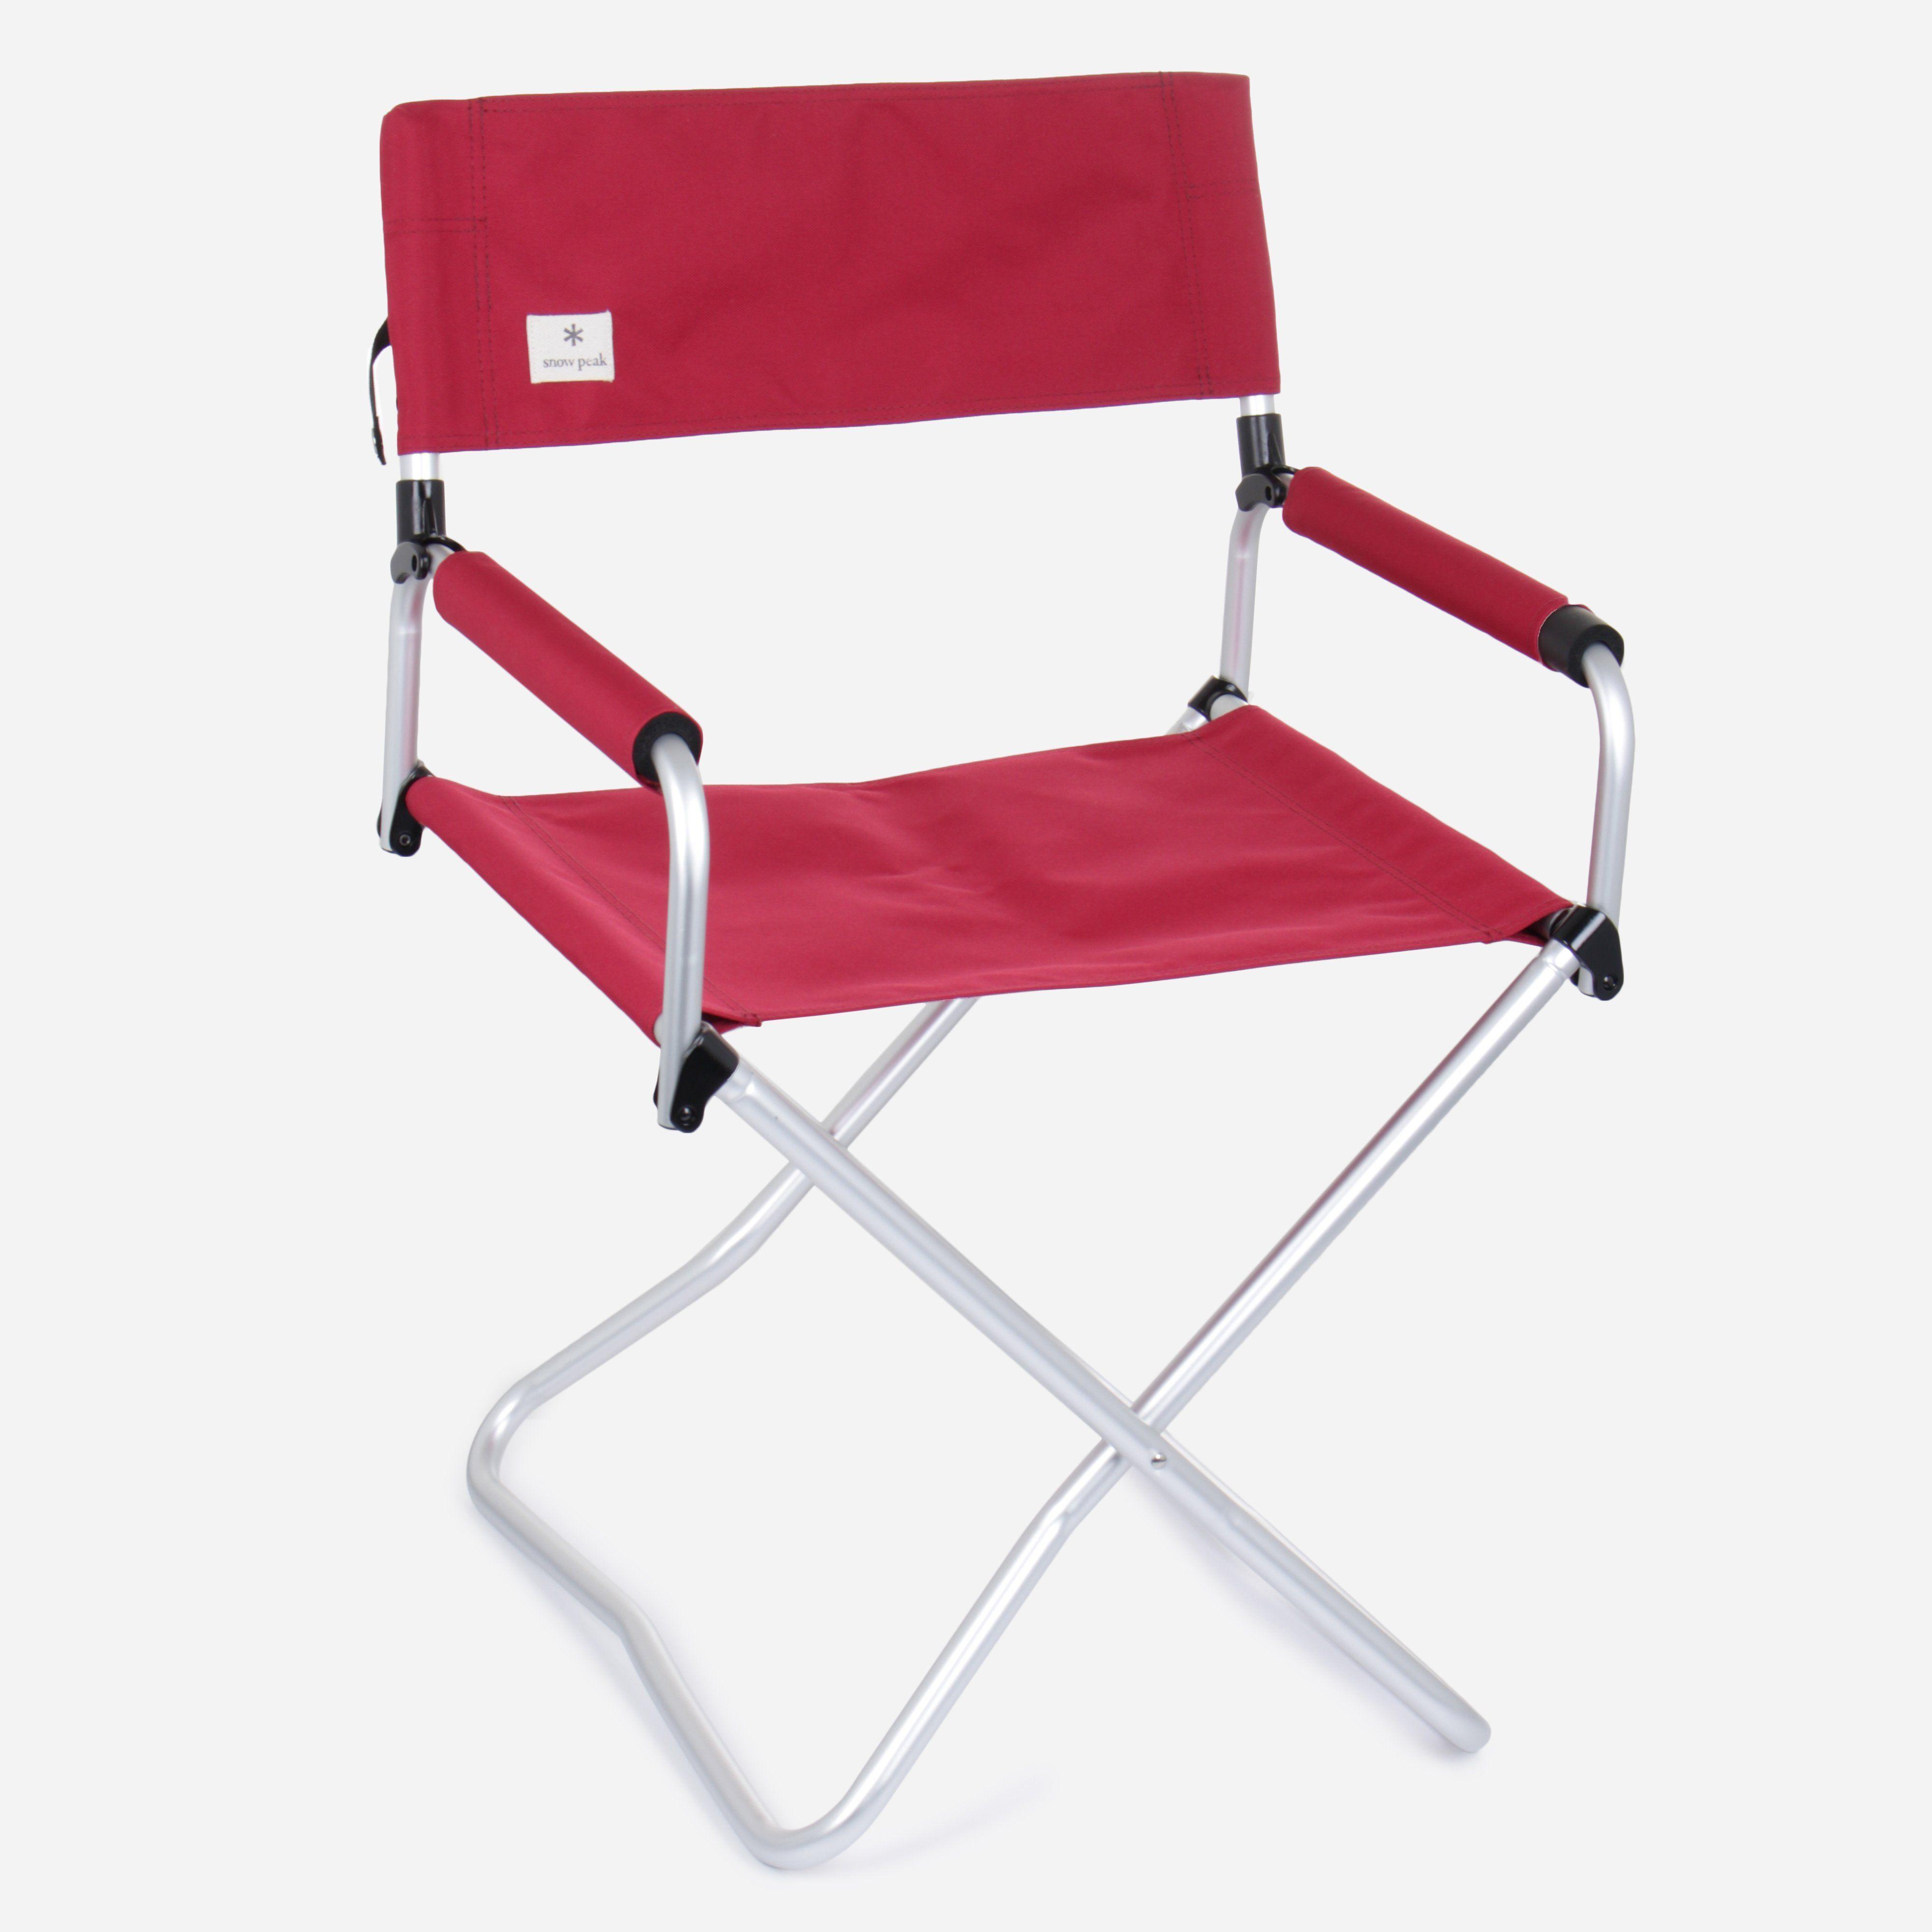 Snow Peak Folding Chair In 2019 Folding Chair Hip Store